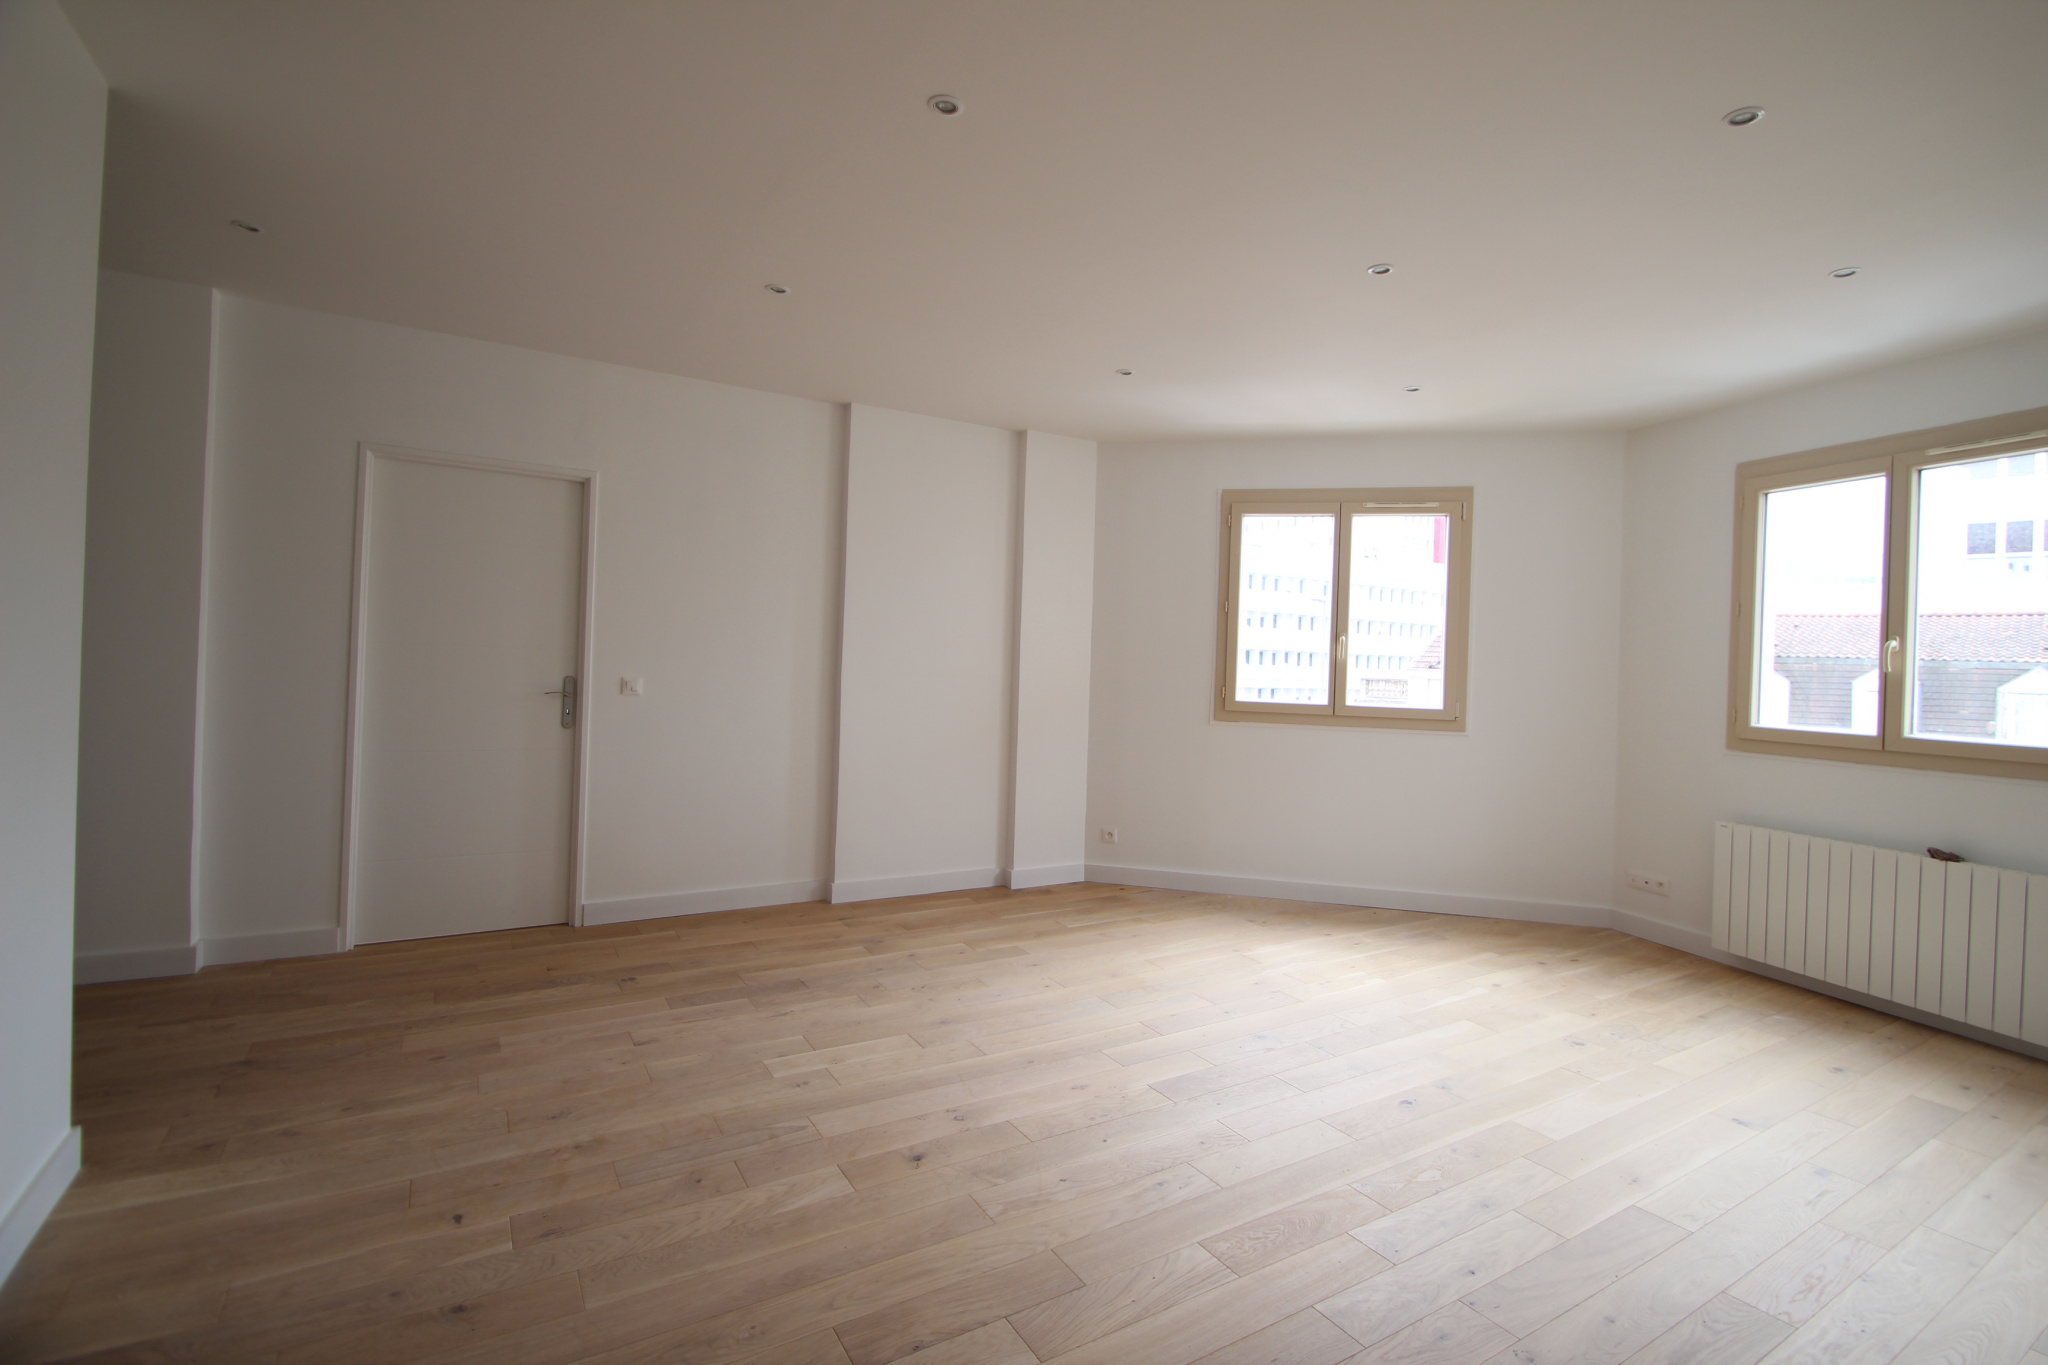 Vente appartement dijon 200M